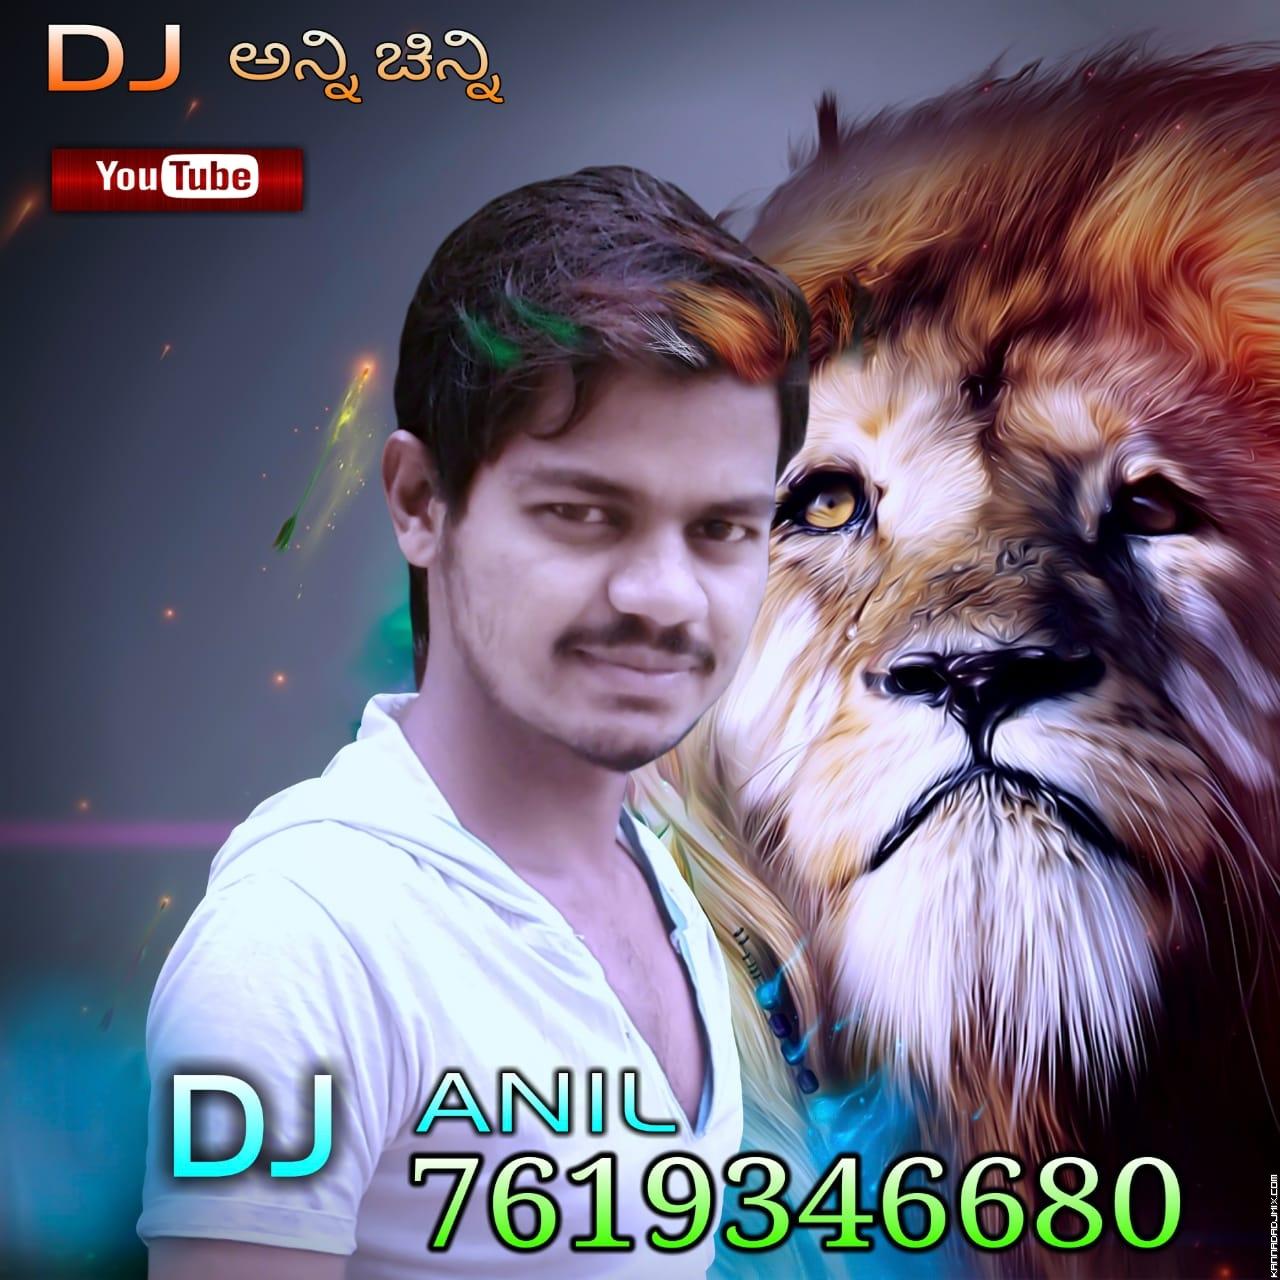 Ee Kannada Anni Chinni - DJ - ANIL VADDAR BHAGAVATHI.mp3